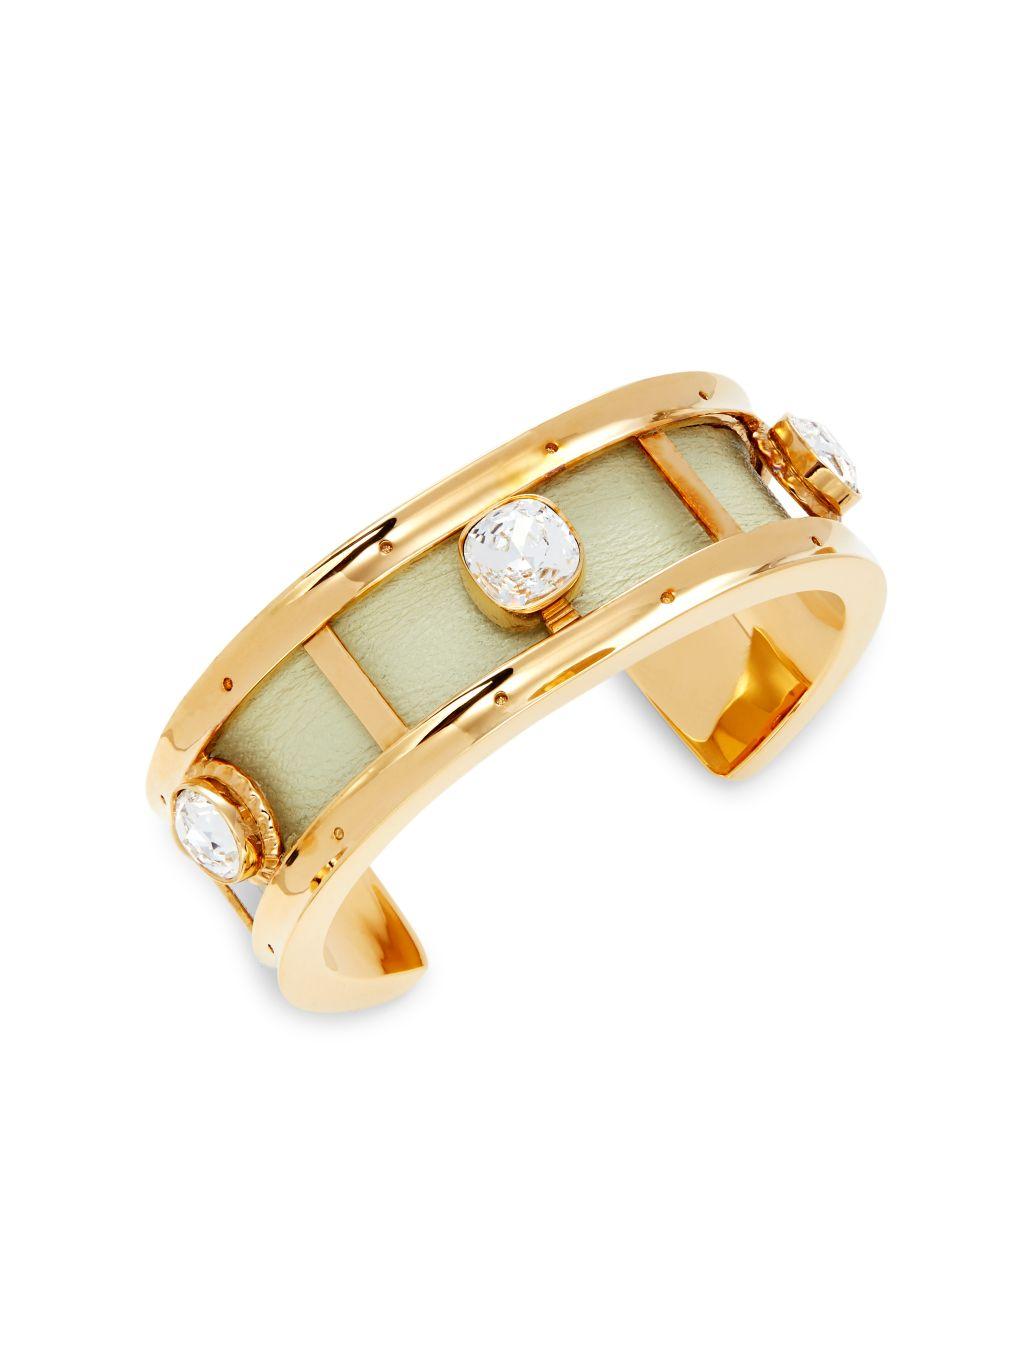 Burberry Goldtone, Leather & Crystal Cuff Bracelet